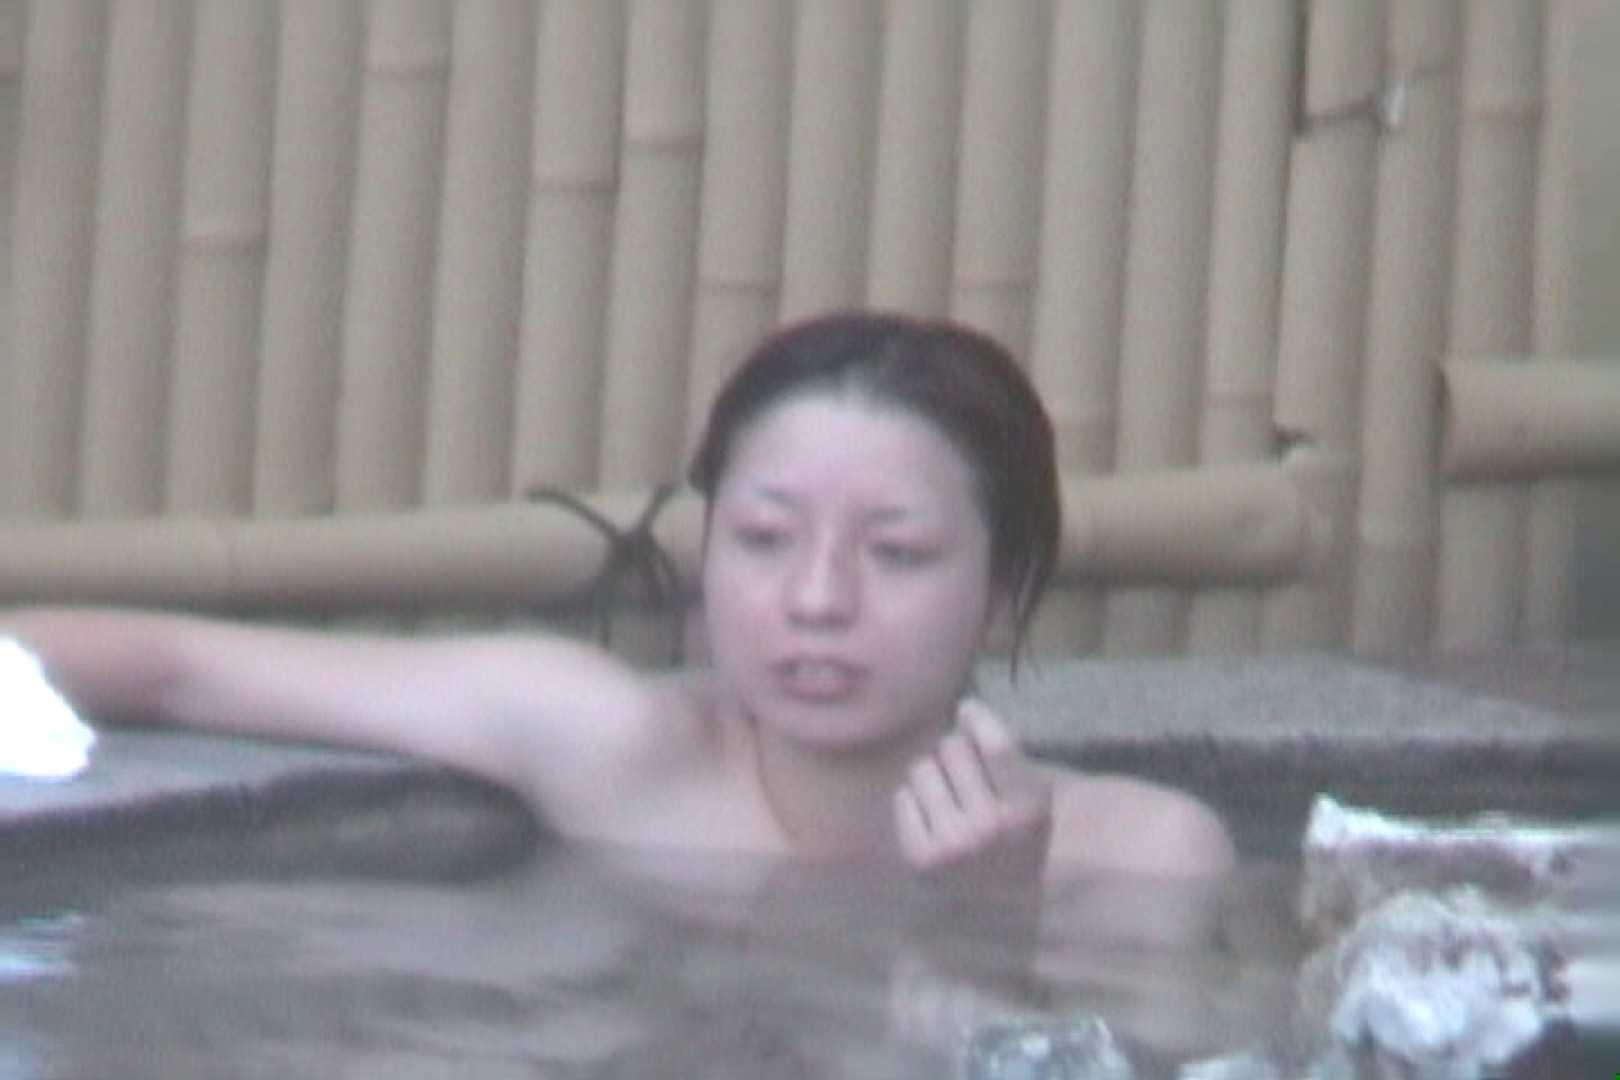 Aquaな露天風呂Vol.608 HなOL | 盗撮  89pic 81